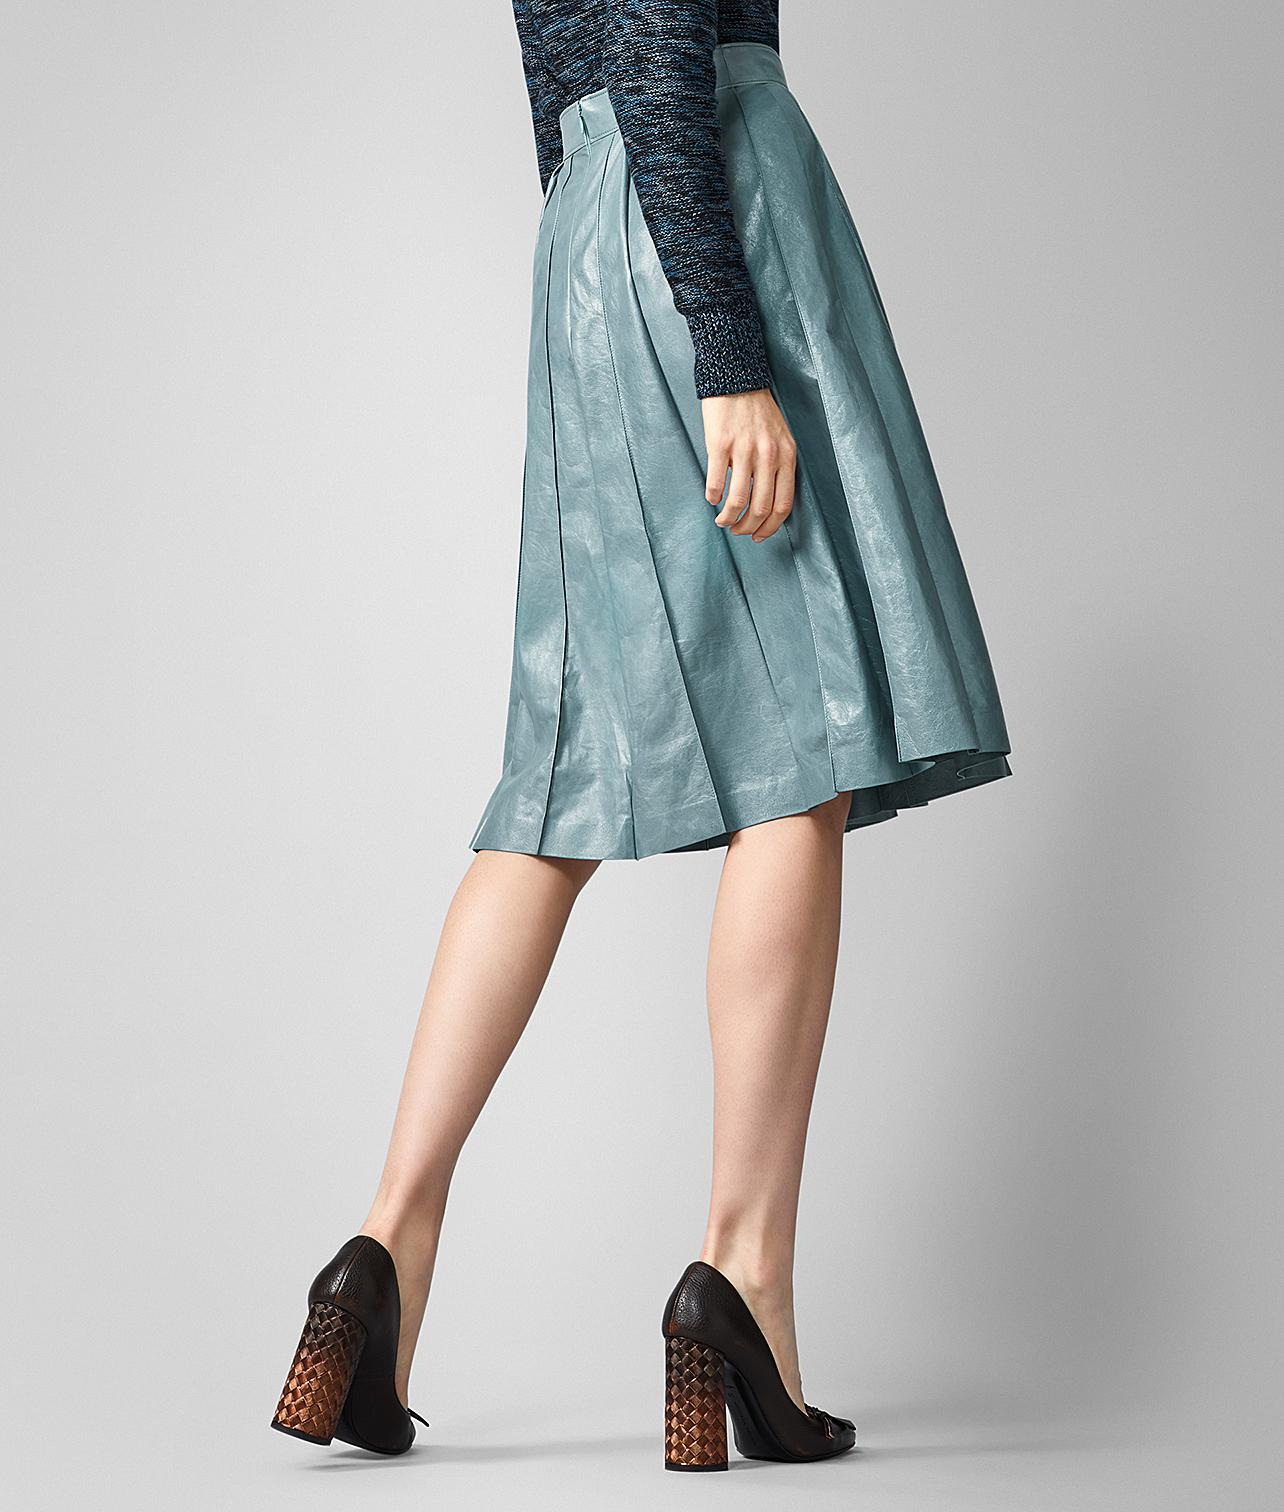 fba3cbc28b Bottega Veneta - Blue Skirt In Lamb - Lyst. View fullscreen